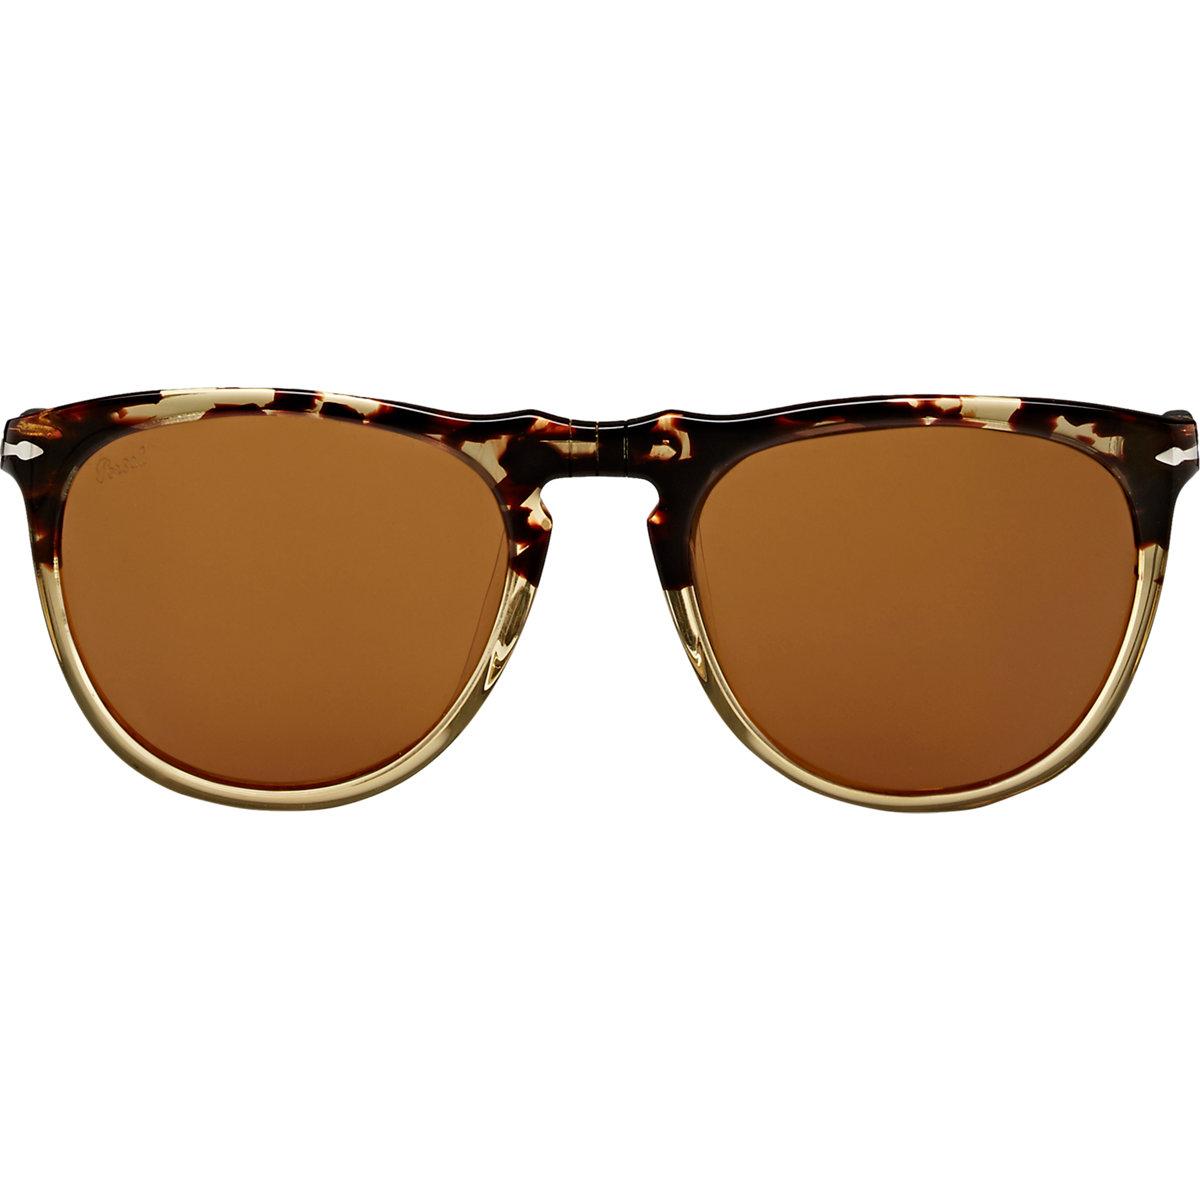 d196b2cd55 Lyst - Persol Suprema Sunglasses in Natural for Men